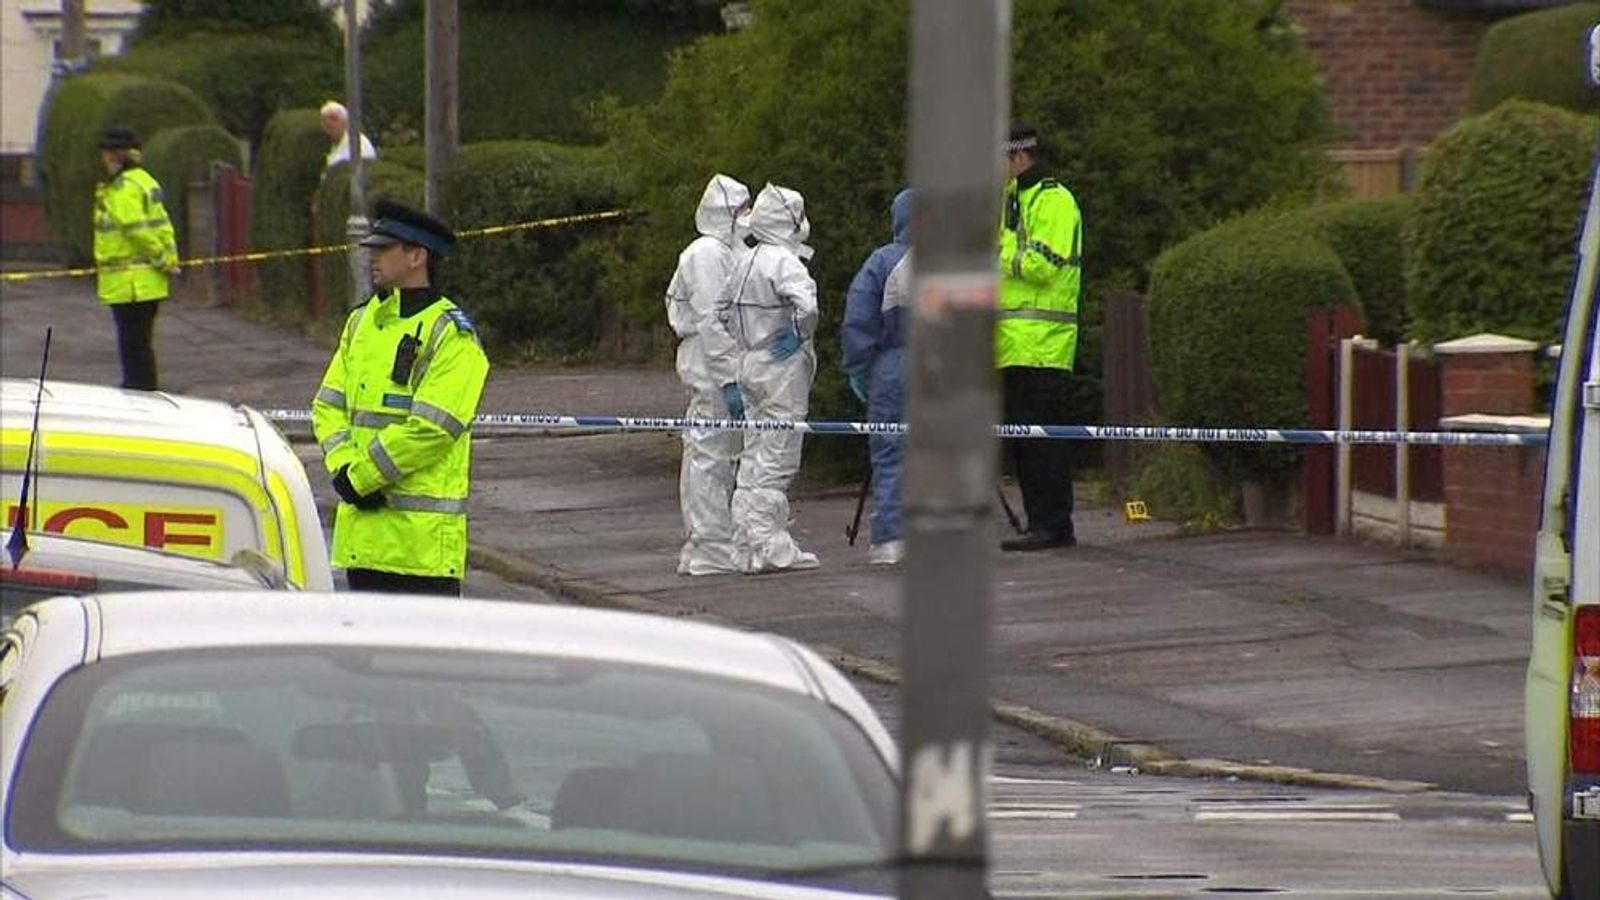 Liverpool, Merseyside shooting scene